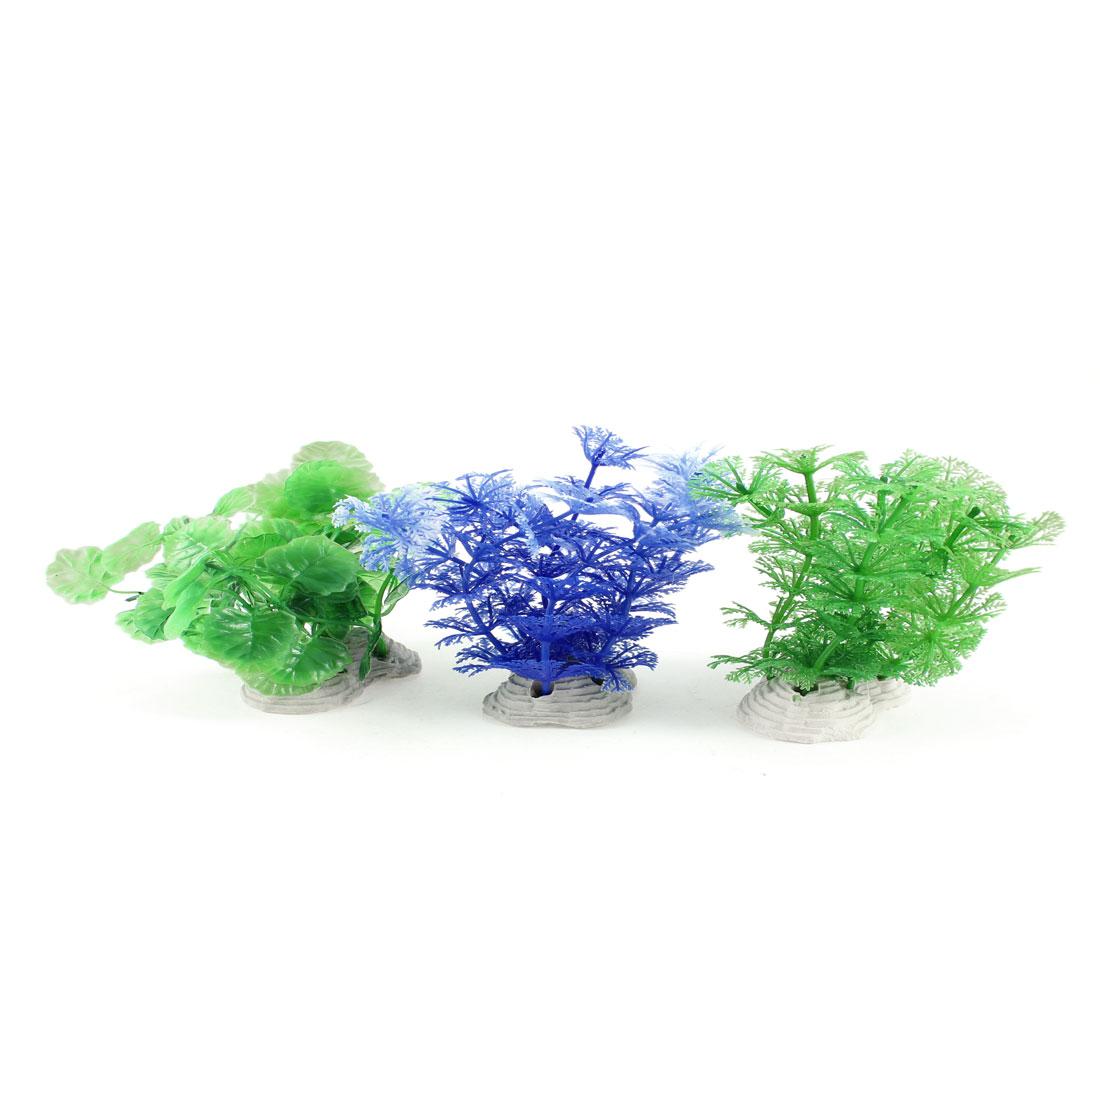 3 Pcs Fish Tank Blue Green Plastic Underwater Grasses Plants Decoration